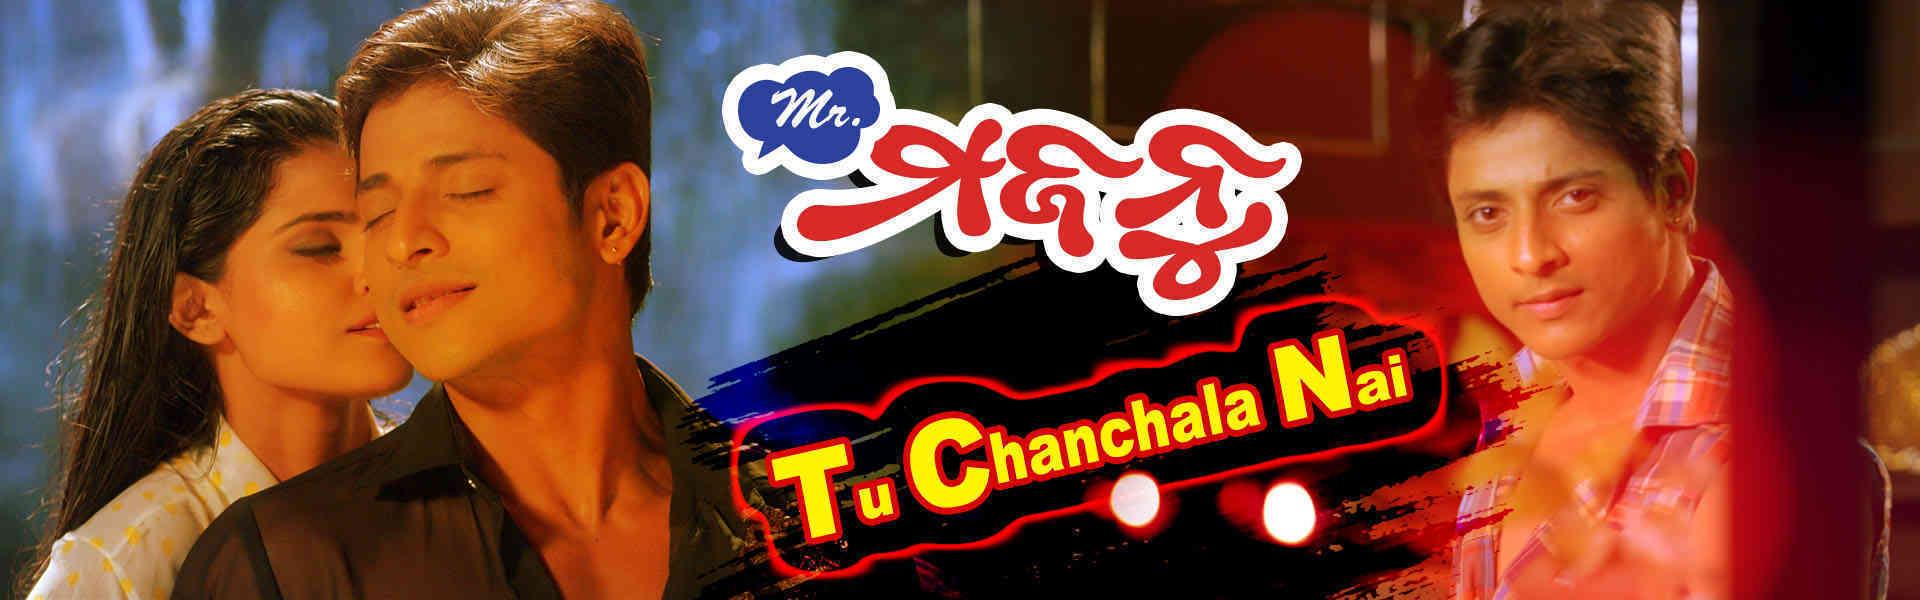 Tu Chanchala Nai